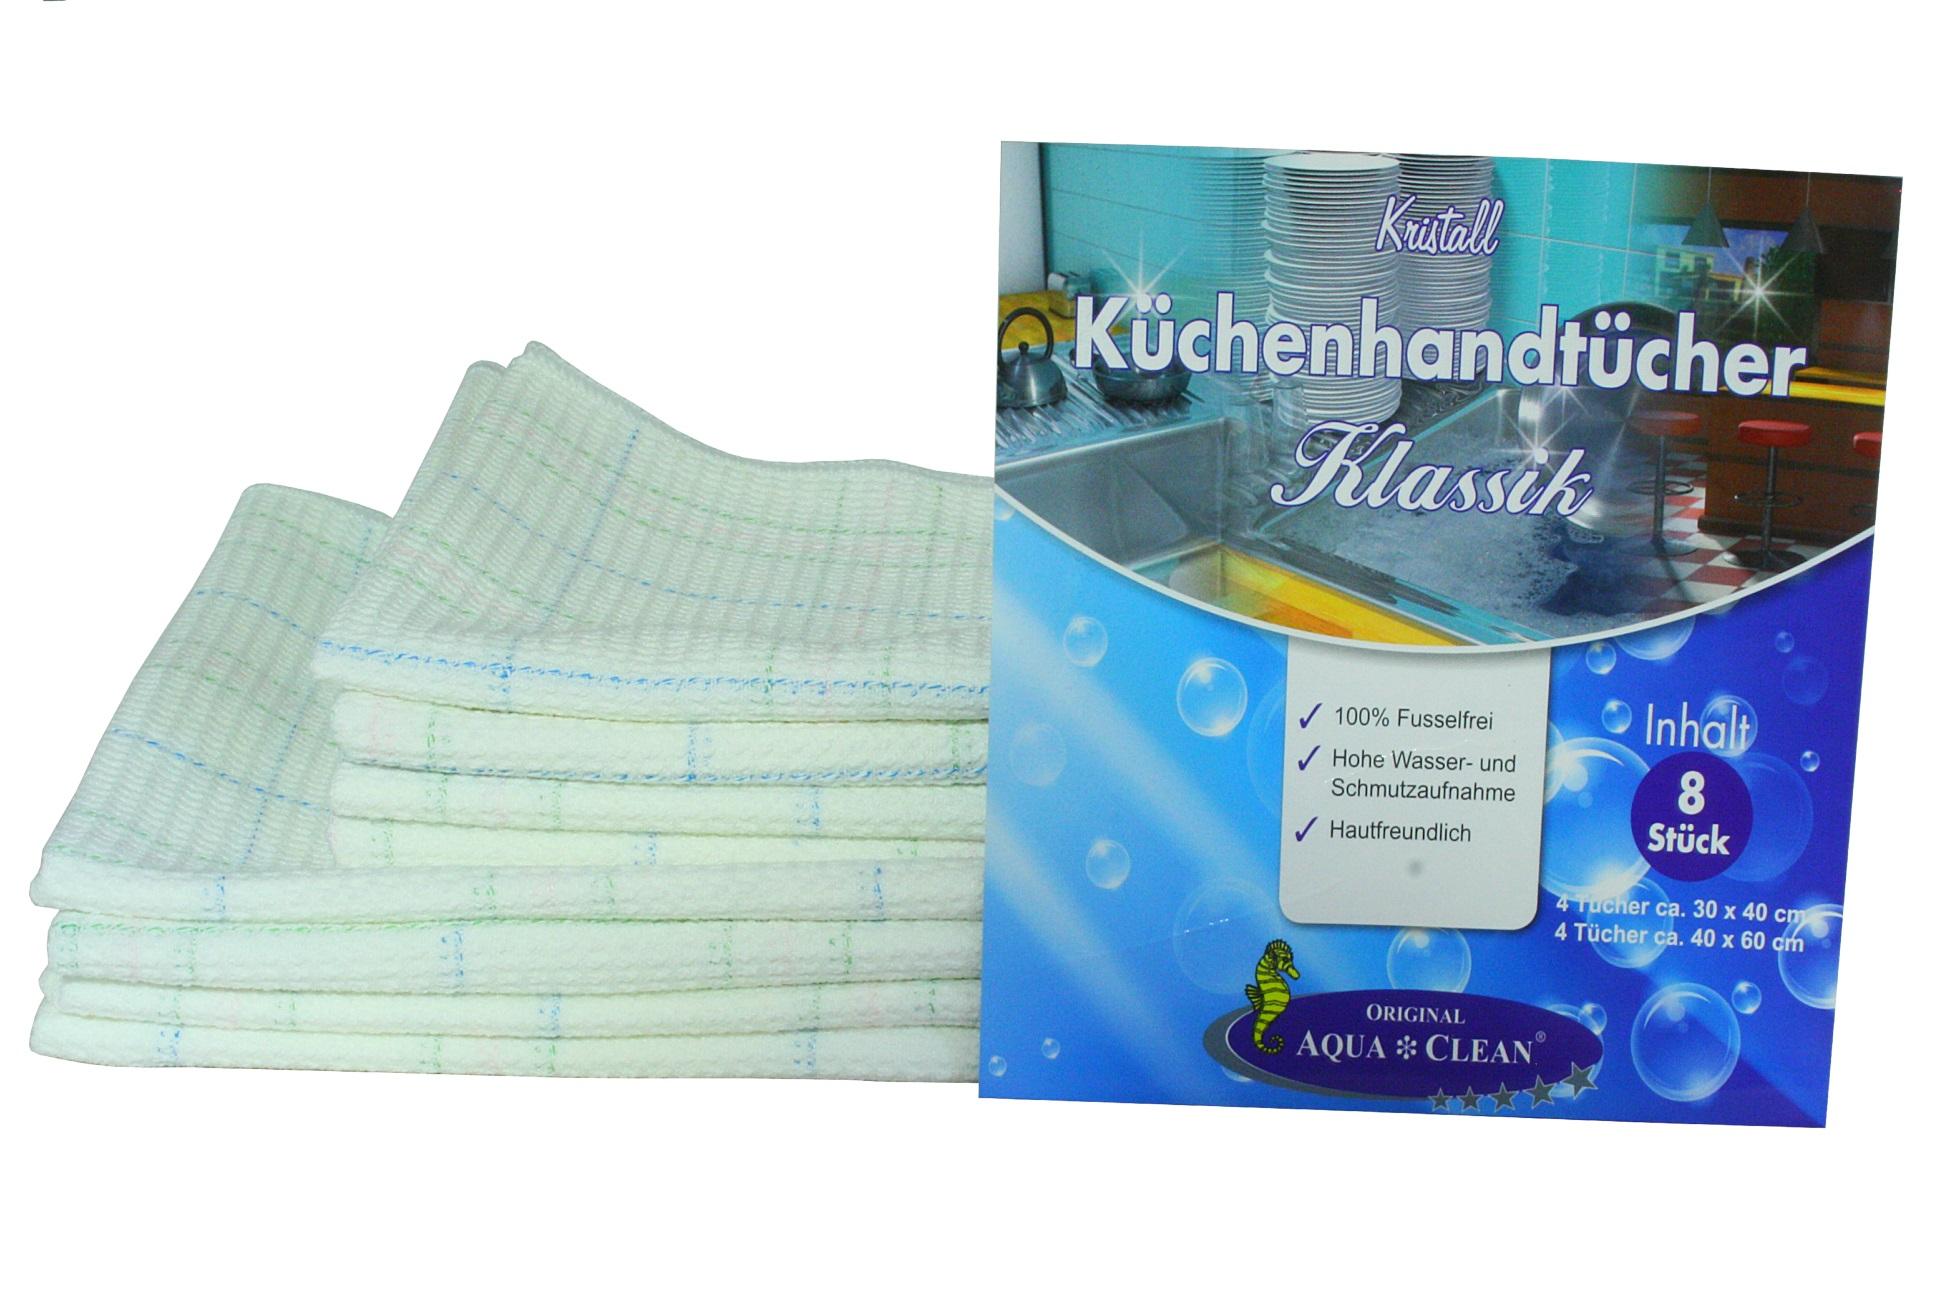 aqua clean kristall klassik k chenhandt cher 8tlg aqua clean direkt vom hersteller. Black Bedroom Furniture Sets. Home Design Ideas